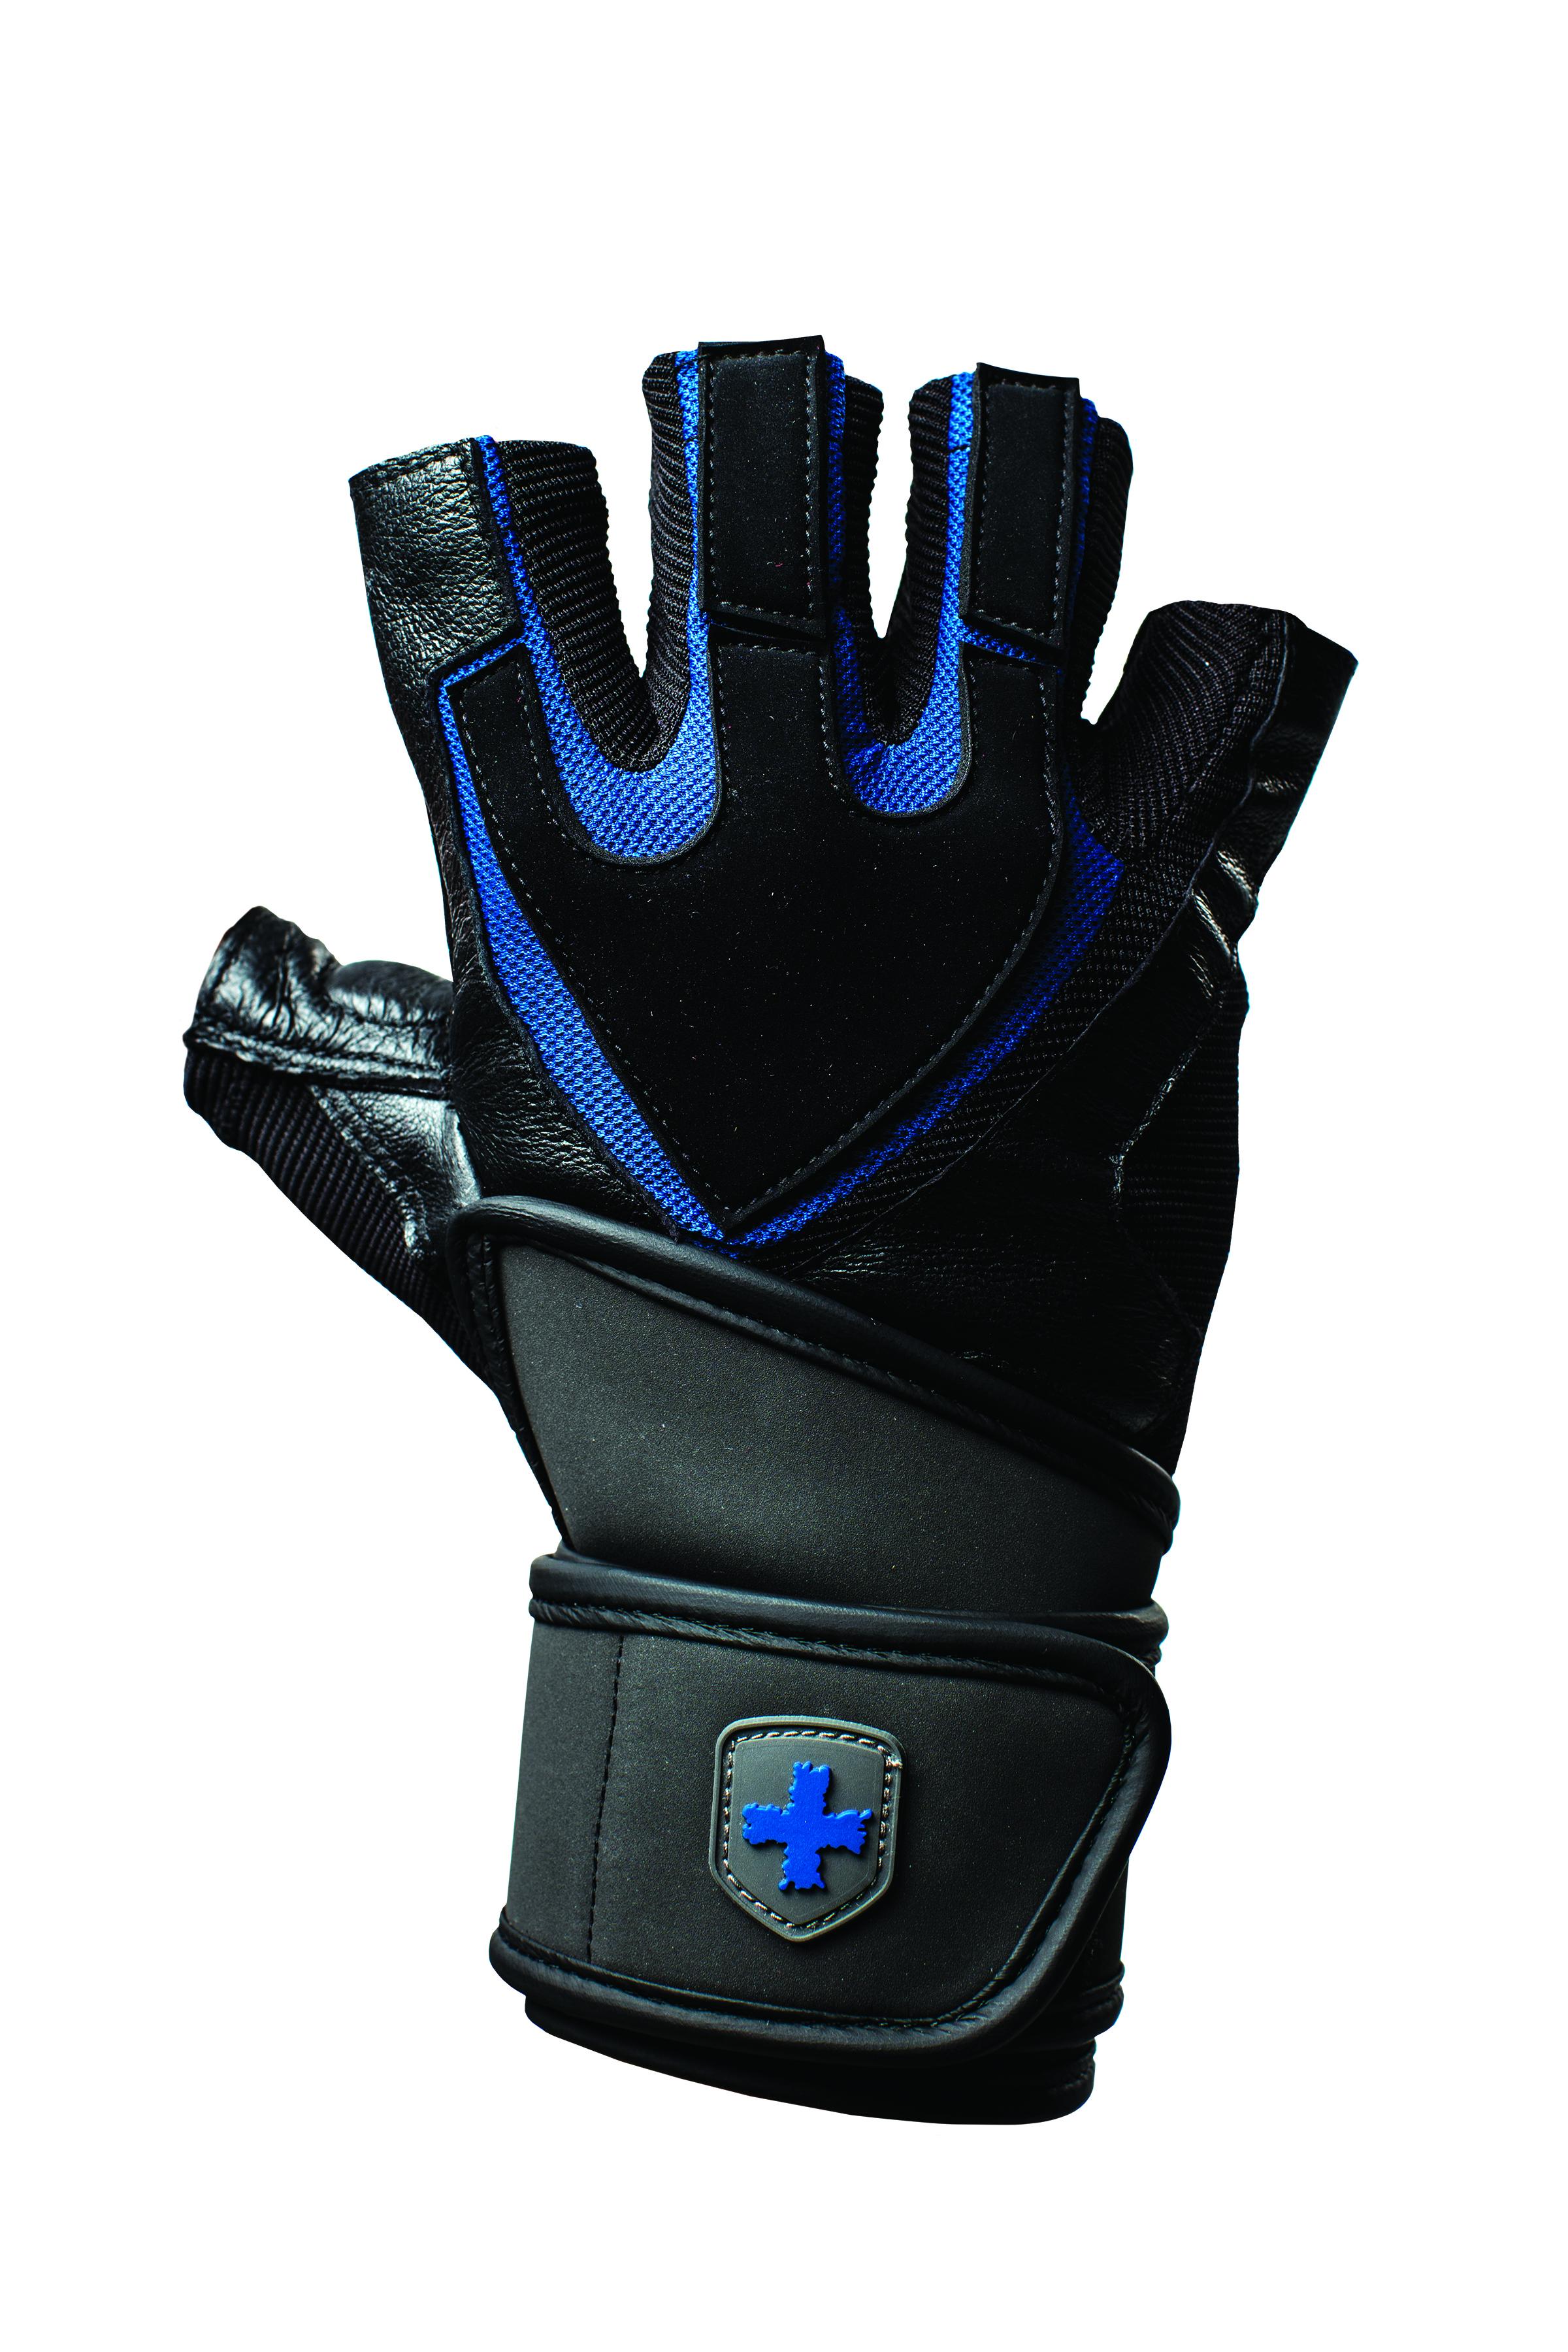 Harbinger Training Grip Gloves Black-Blue L